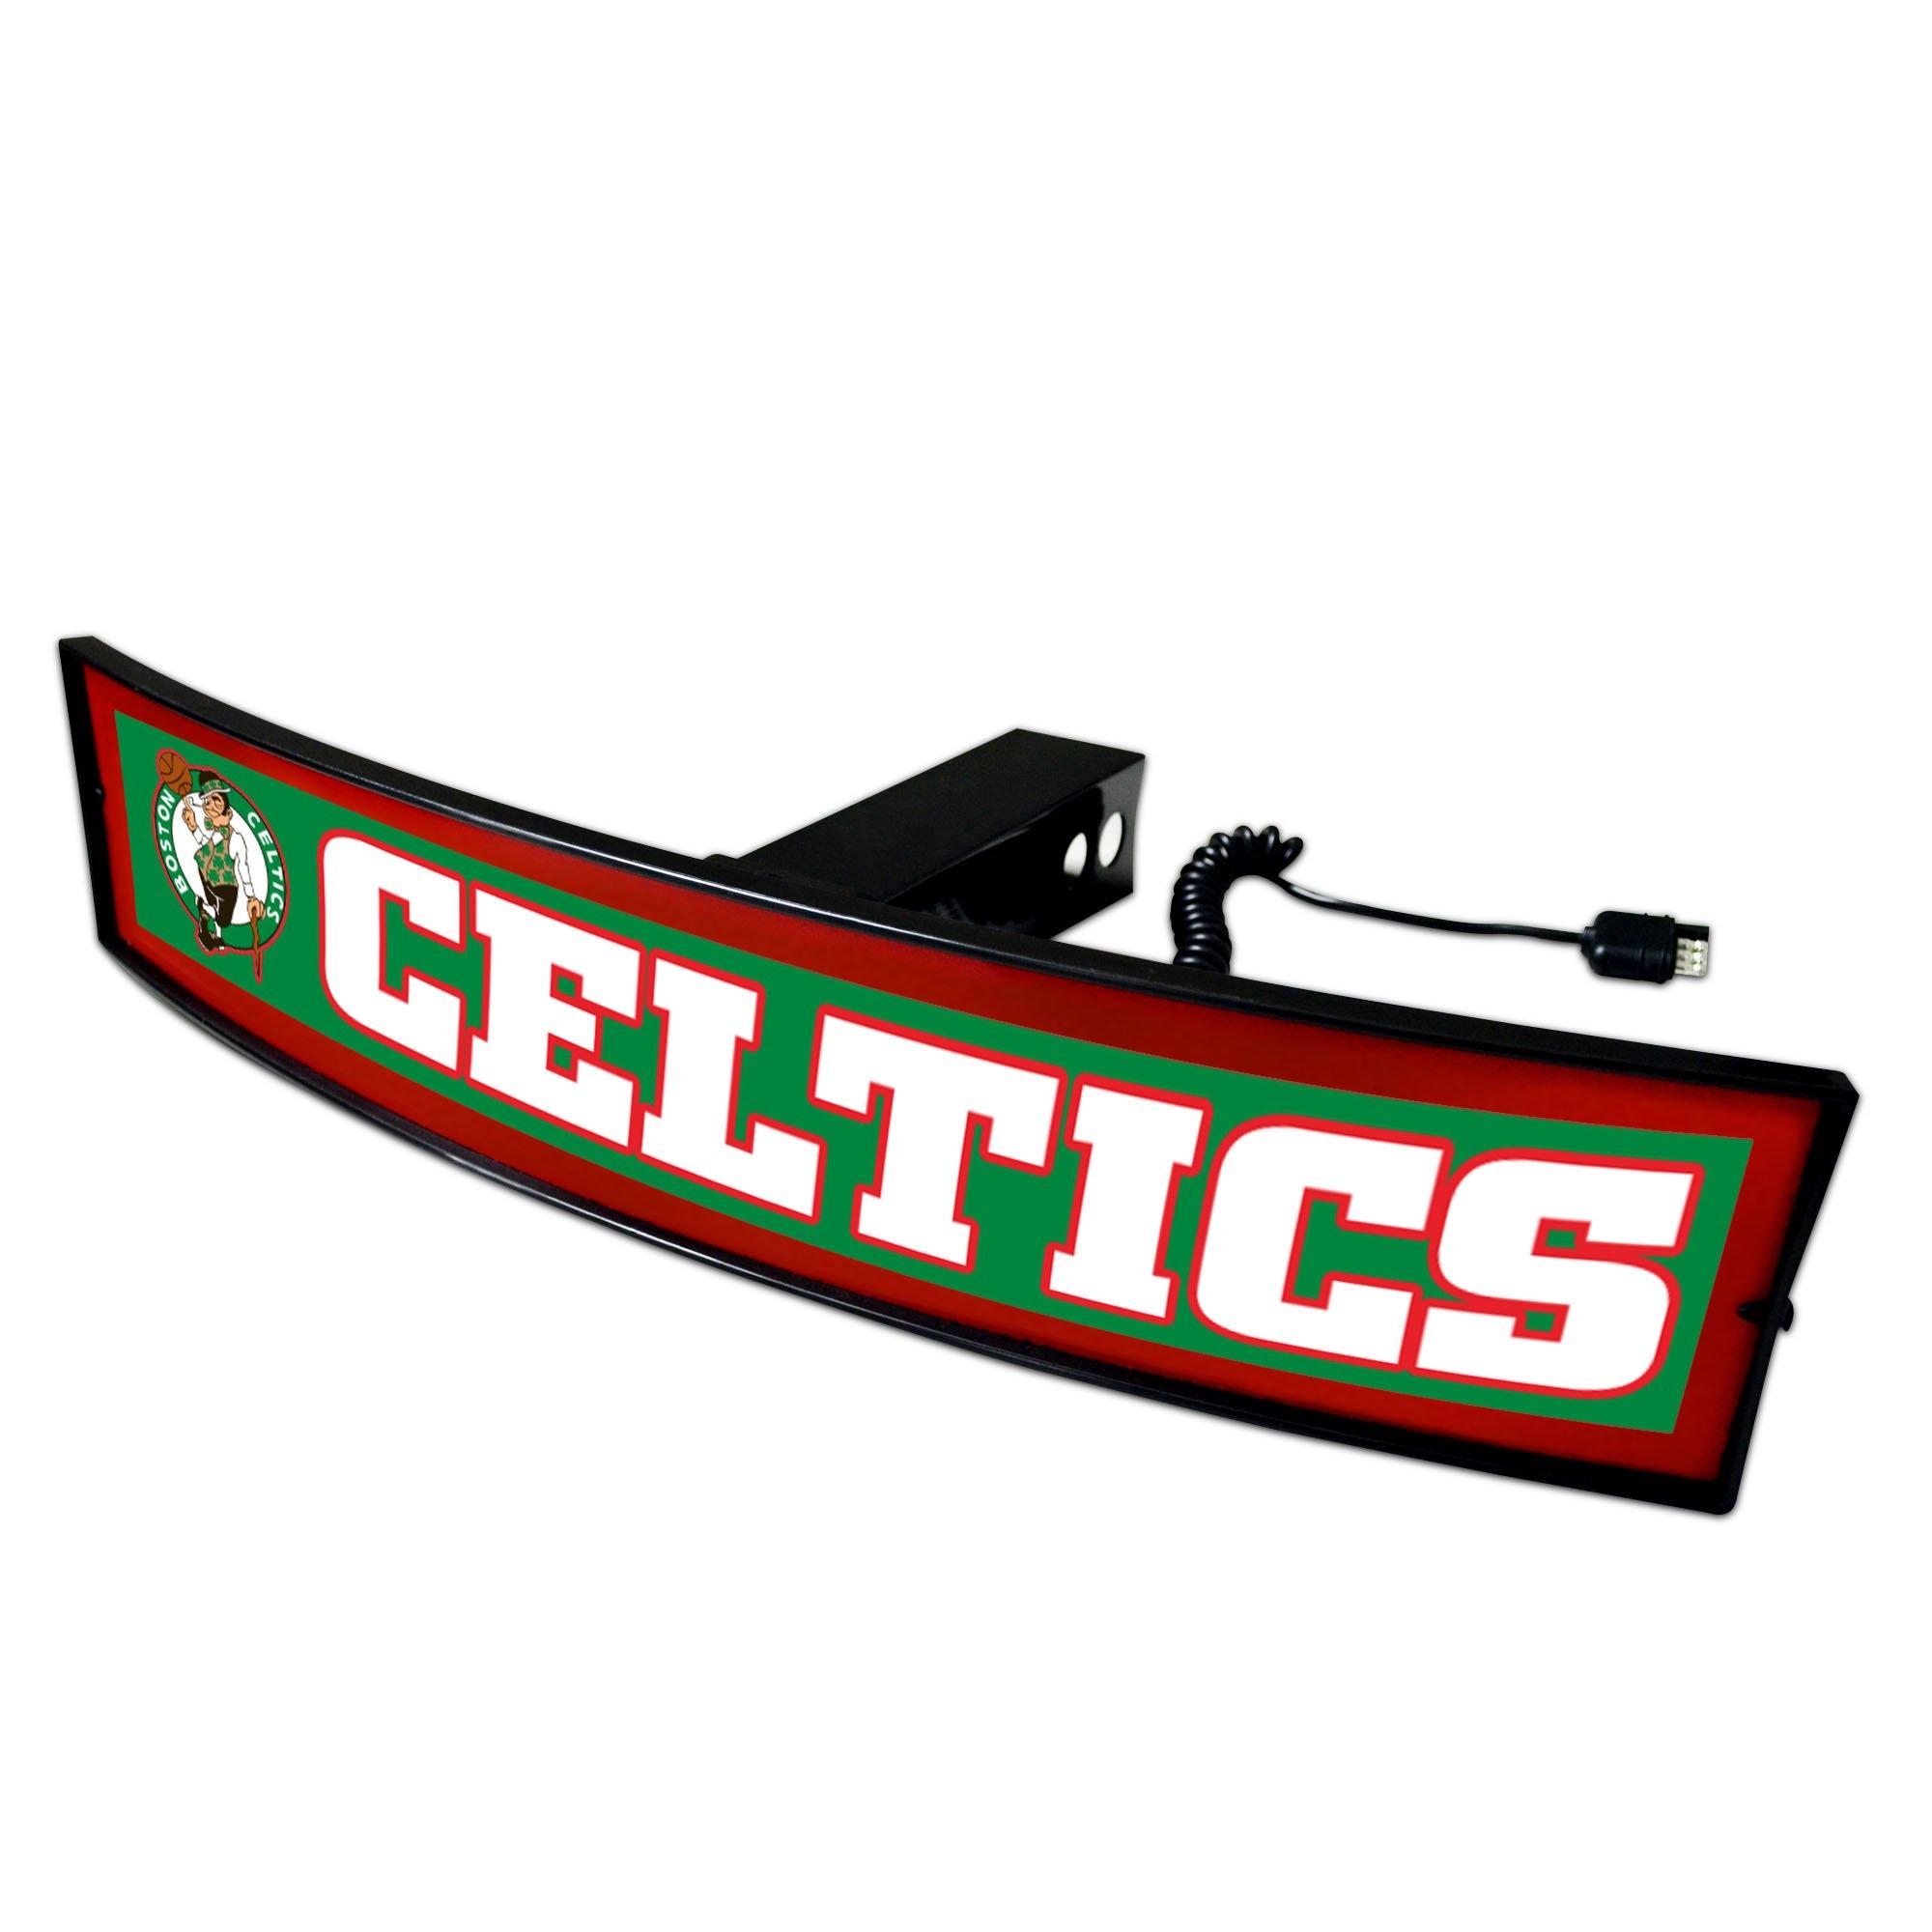 CC Sports Decor NBA - Boston Celtics Light Up Hitch Cover - 21''x9.5''